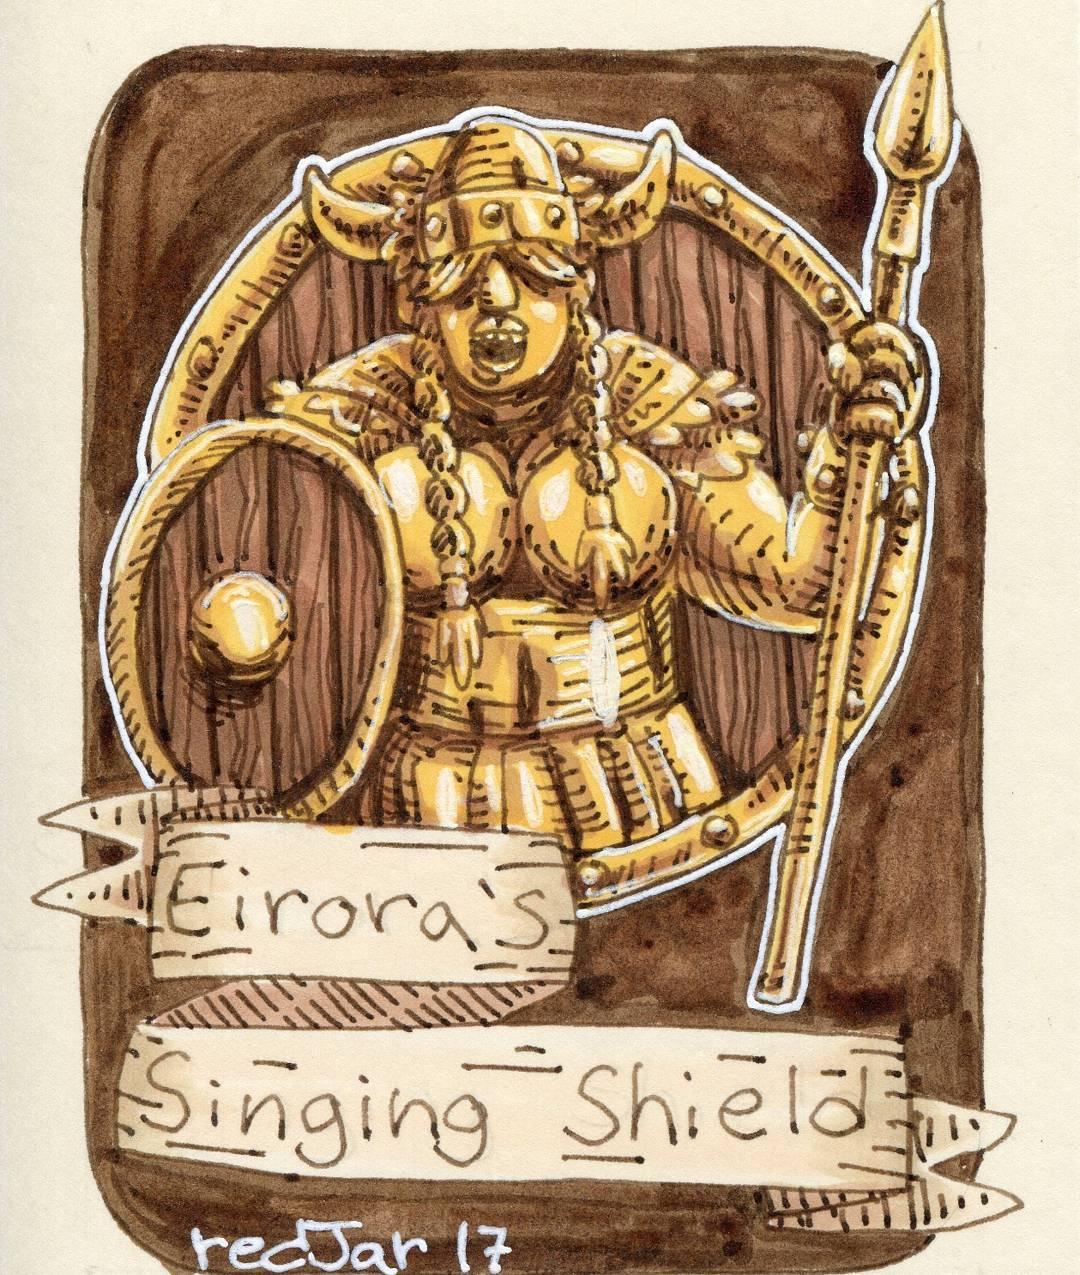 "redjarojam ""Eirora's Singing Shield"" - by Jared DeCosta (redjarojam) www.instagram.com/redjarojam (2017-04) © dell'autore tutti i diritti riservati"